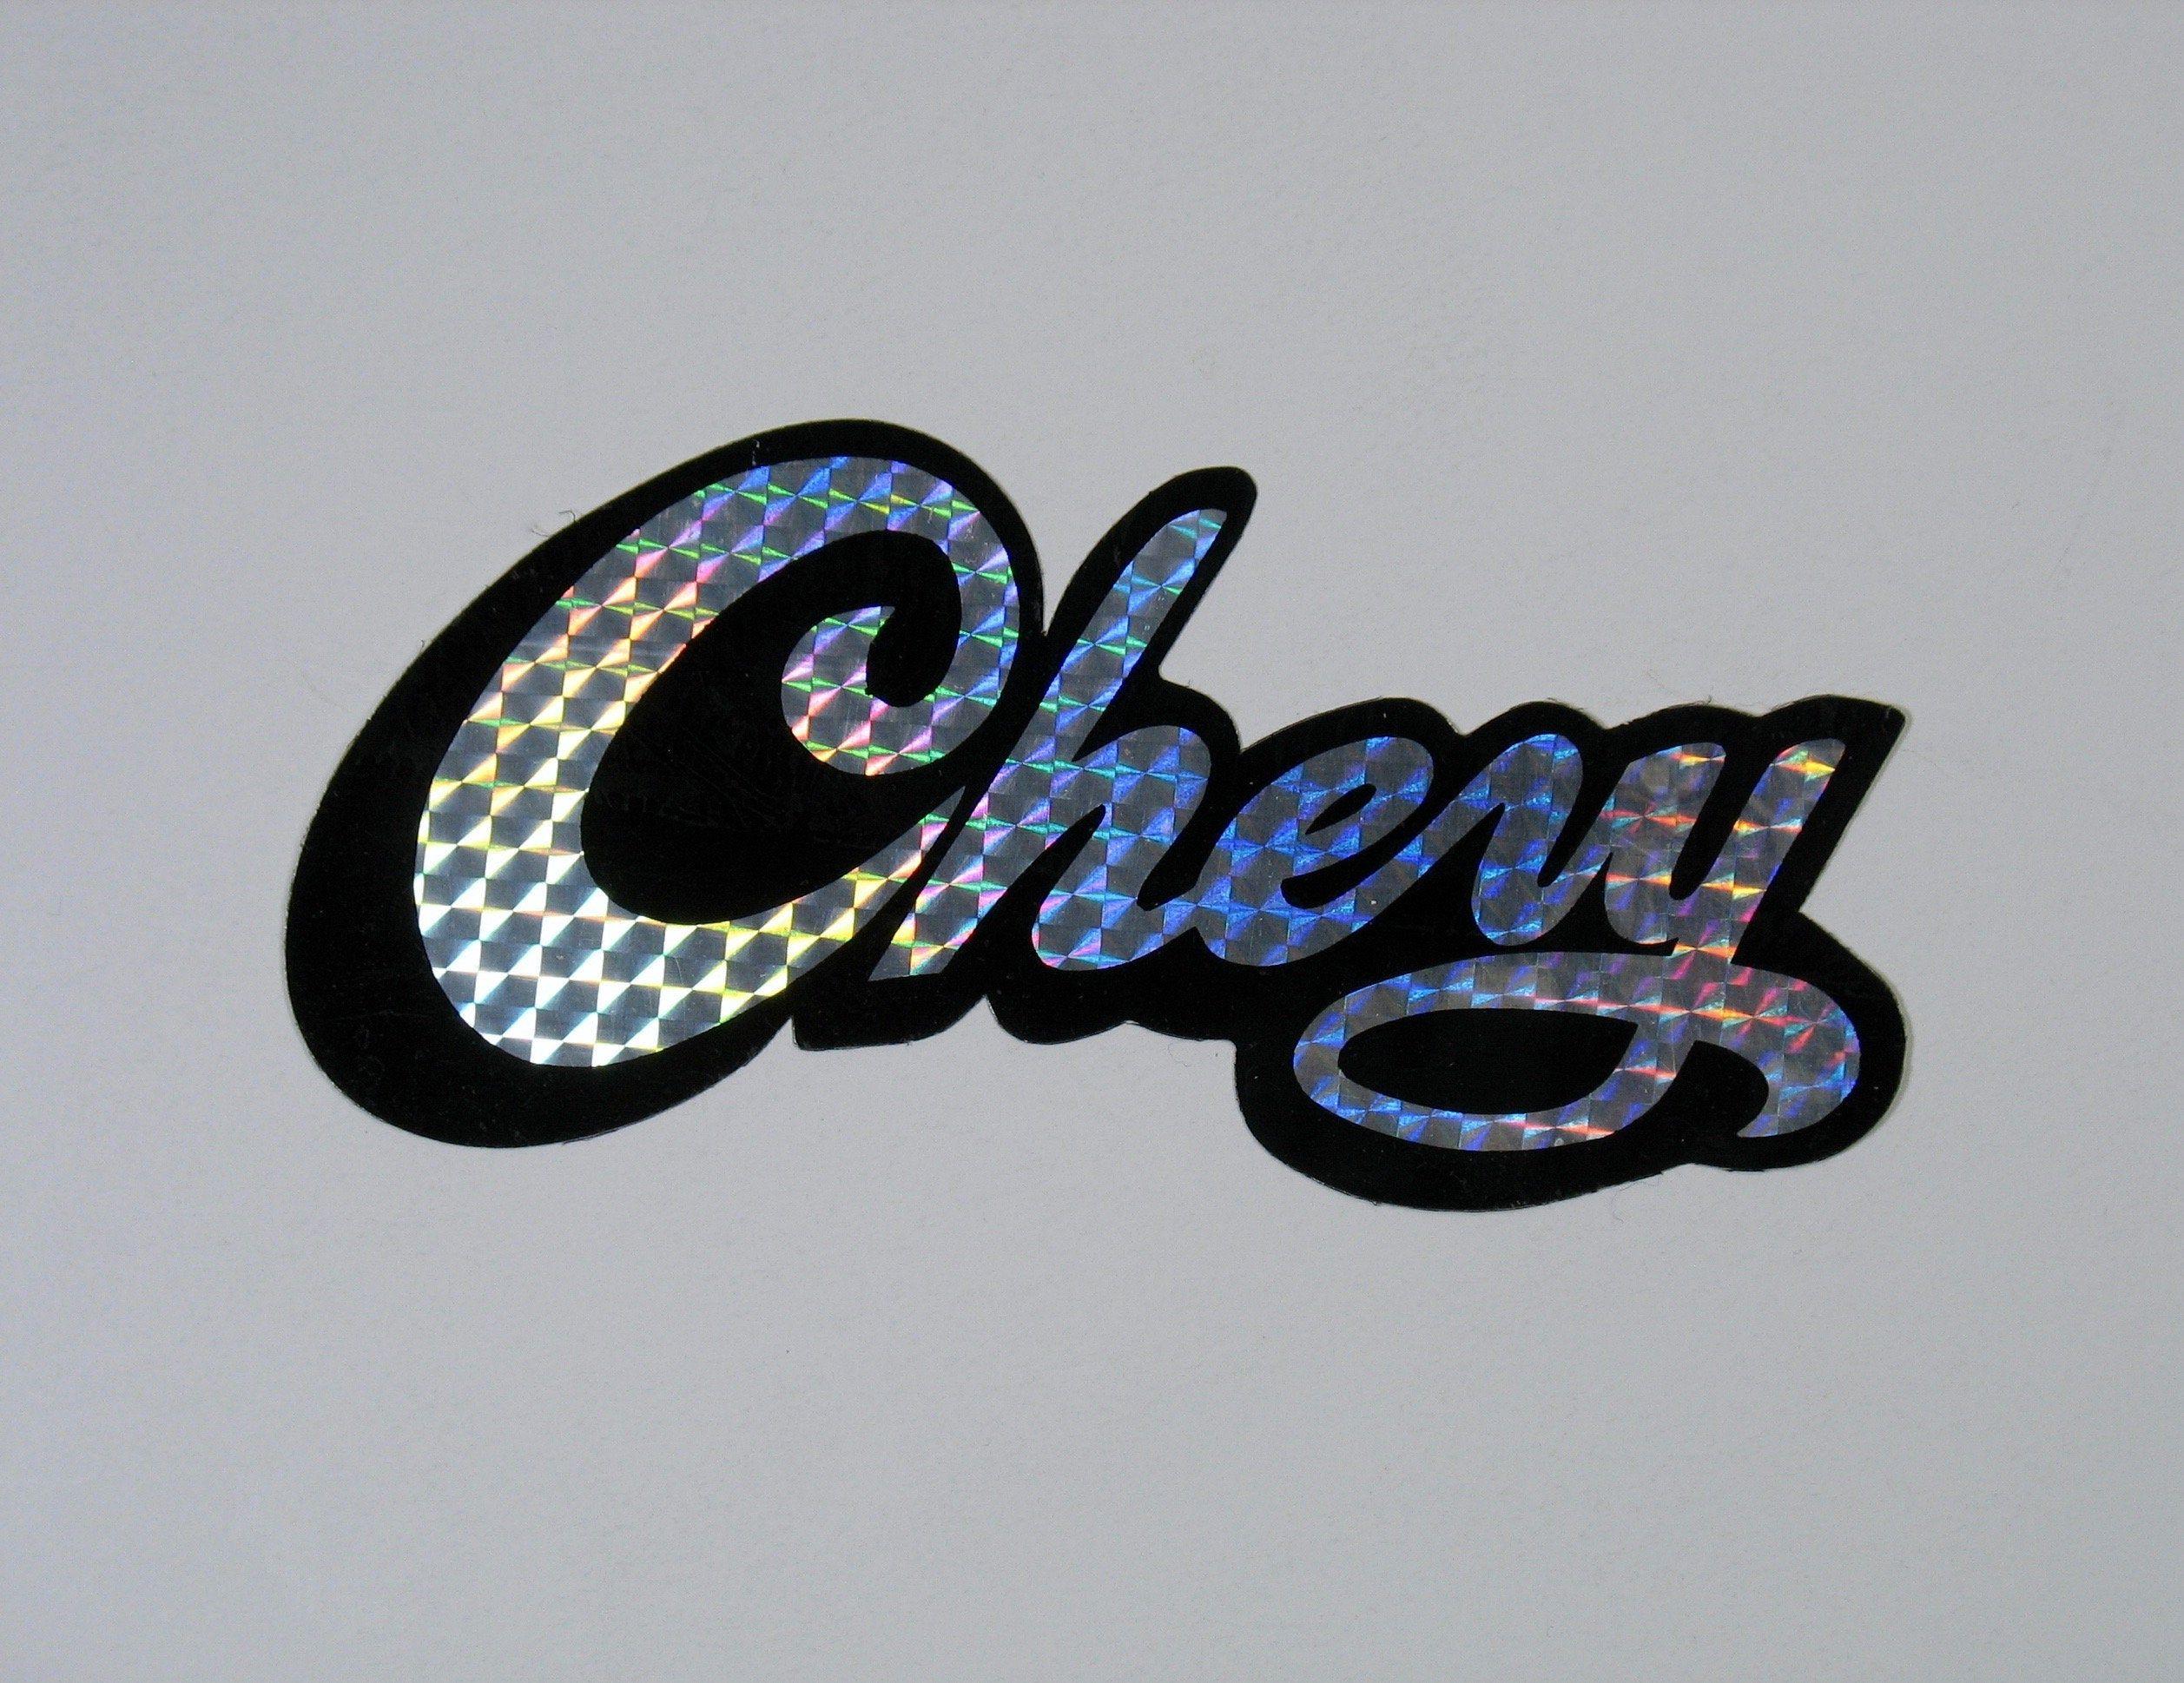 Vintage Chevy Prism Sticker Vending Decal Camper Van Holographic Reflective Chevrolet Muscle Car Logo 70s 80s Bar Pub Shop Car Logos Chevy Camper Van [ 1938 x 2515 Pixel ]